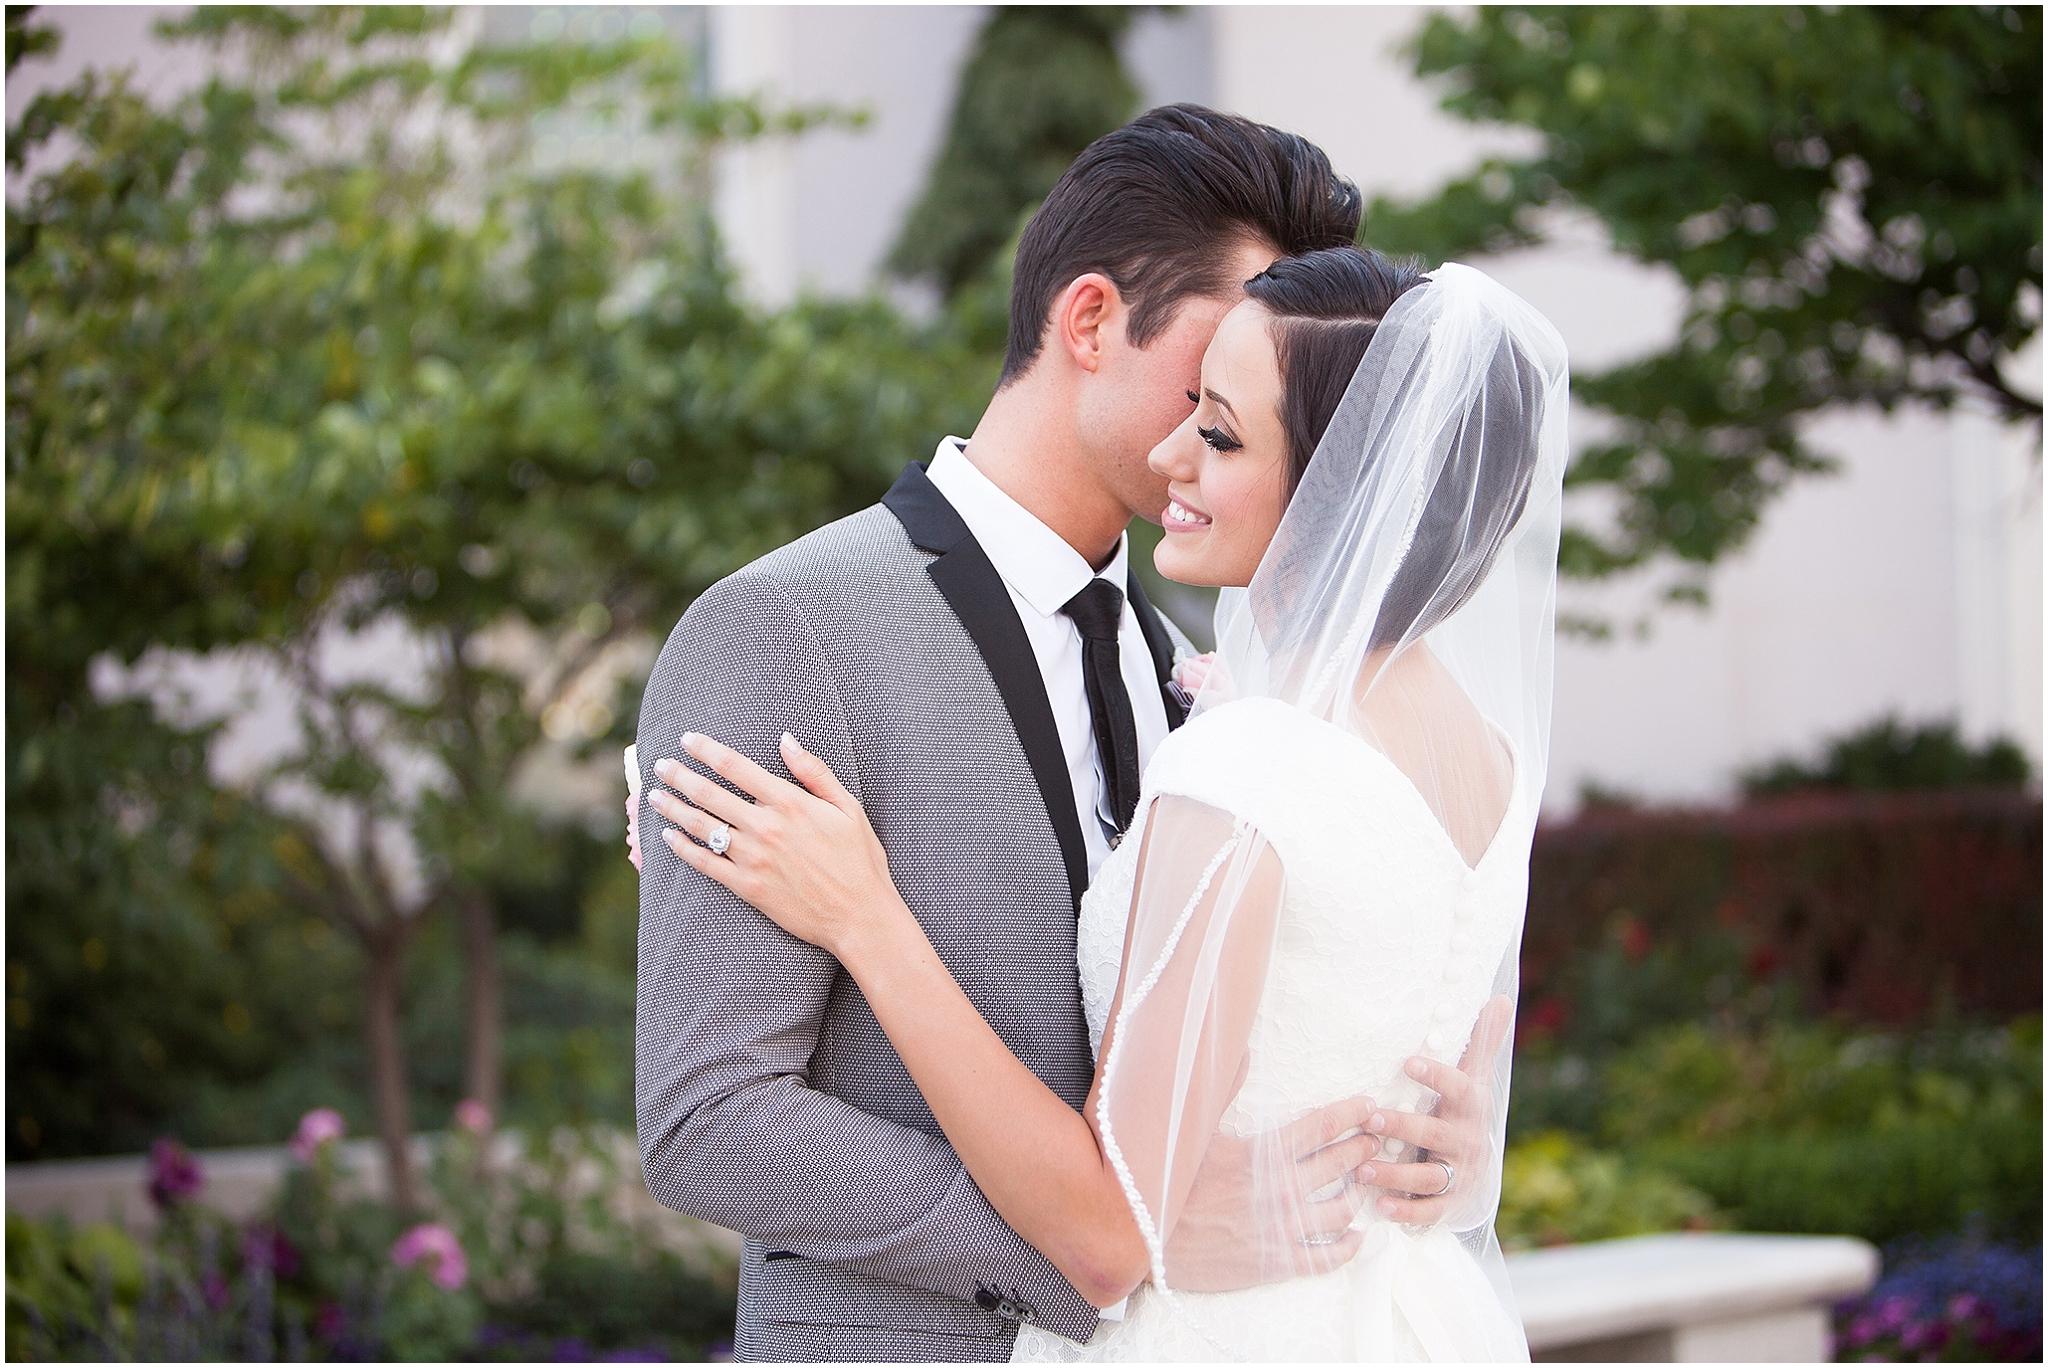 IMG_0009-Edit-100_Lizzie-B-Imagery-Utah-Wedding-Photographer-Salt-Lake-City-Park-City-timpanogos-Utah-Temple.jpg